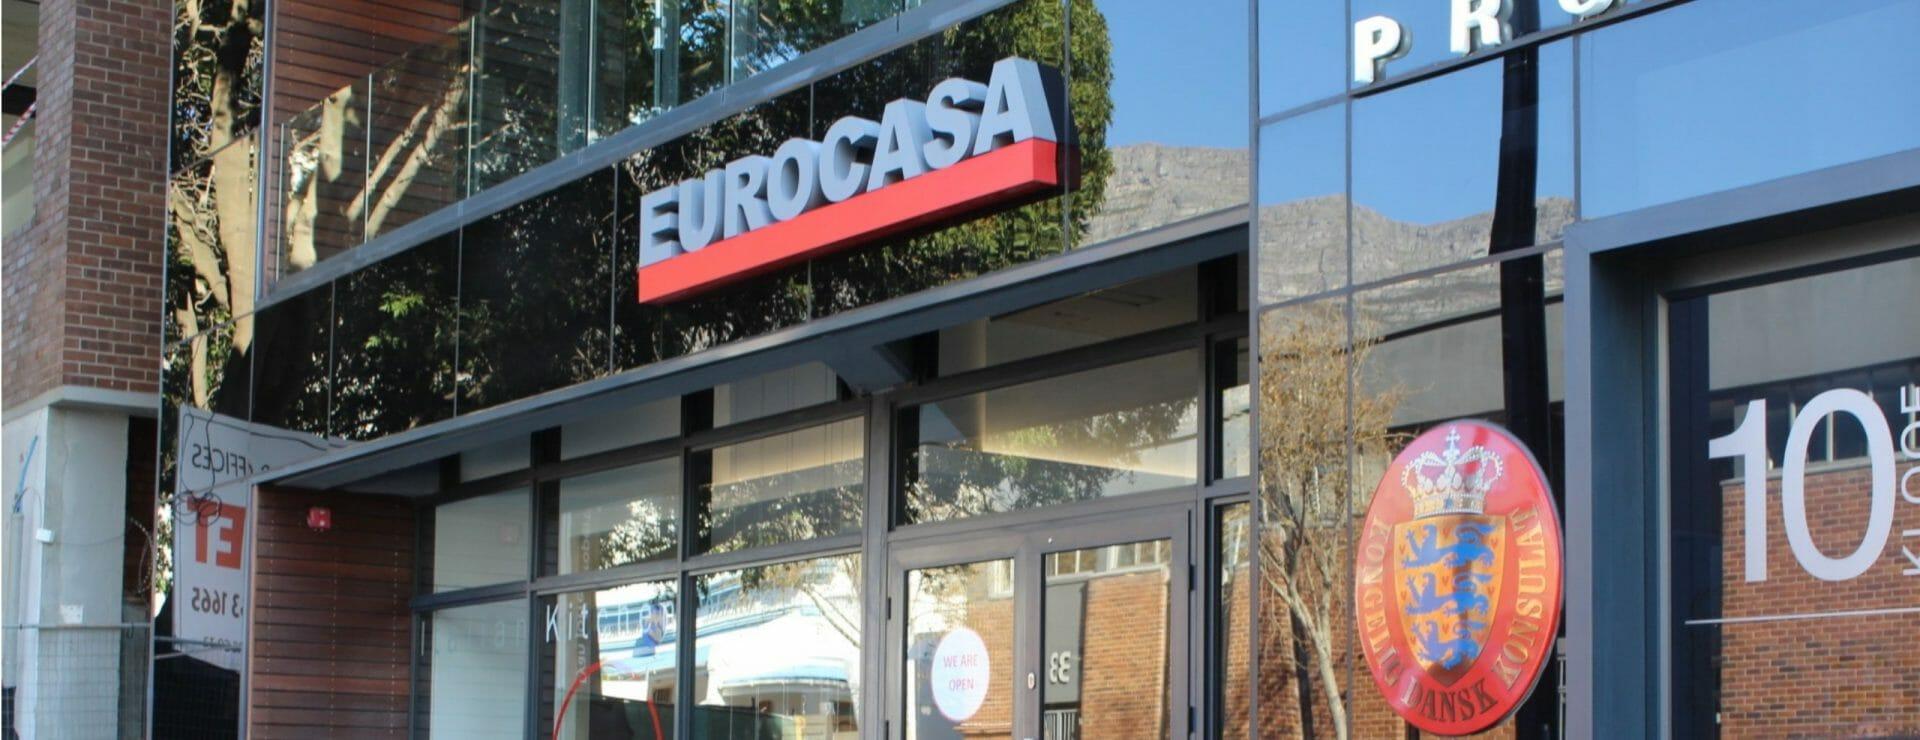 Eurocasa Cape Town